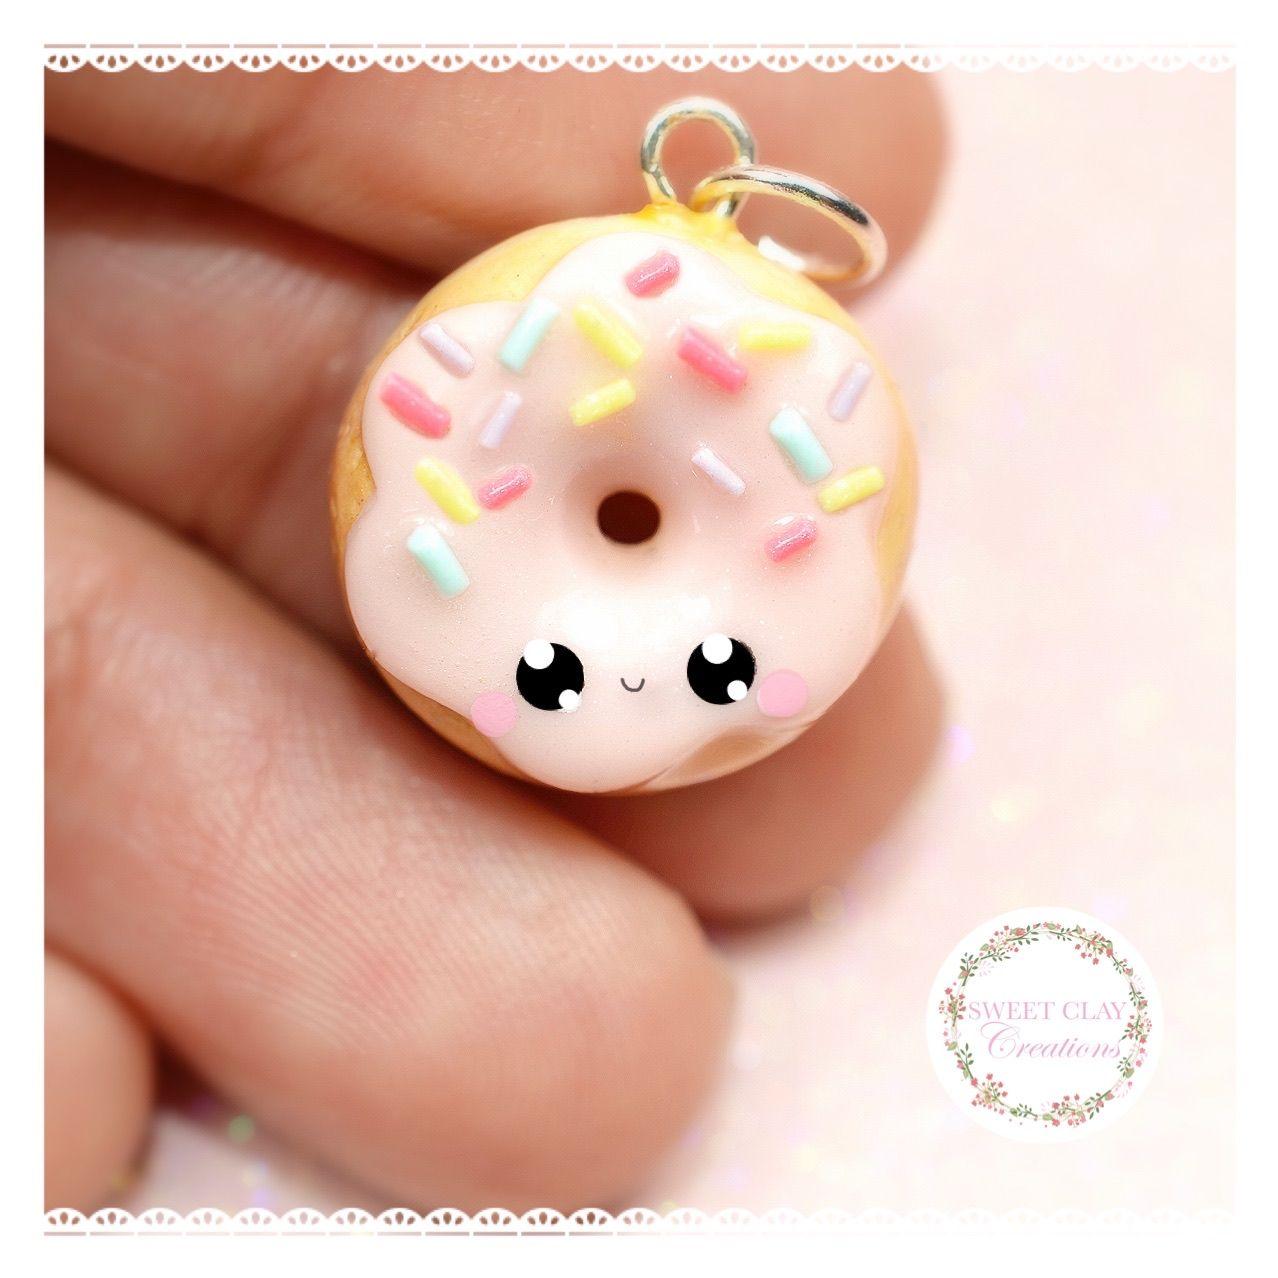 Handmade adorable donut charm earrings